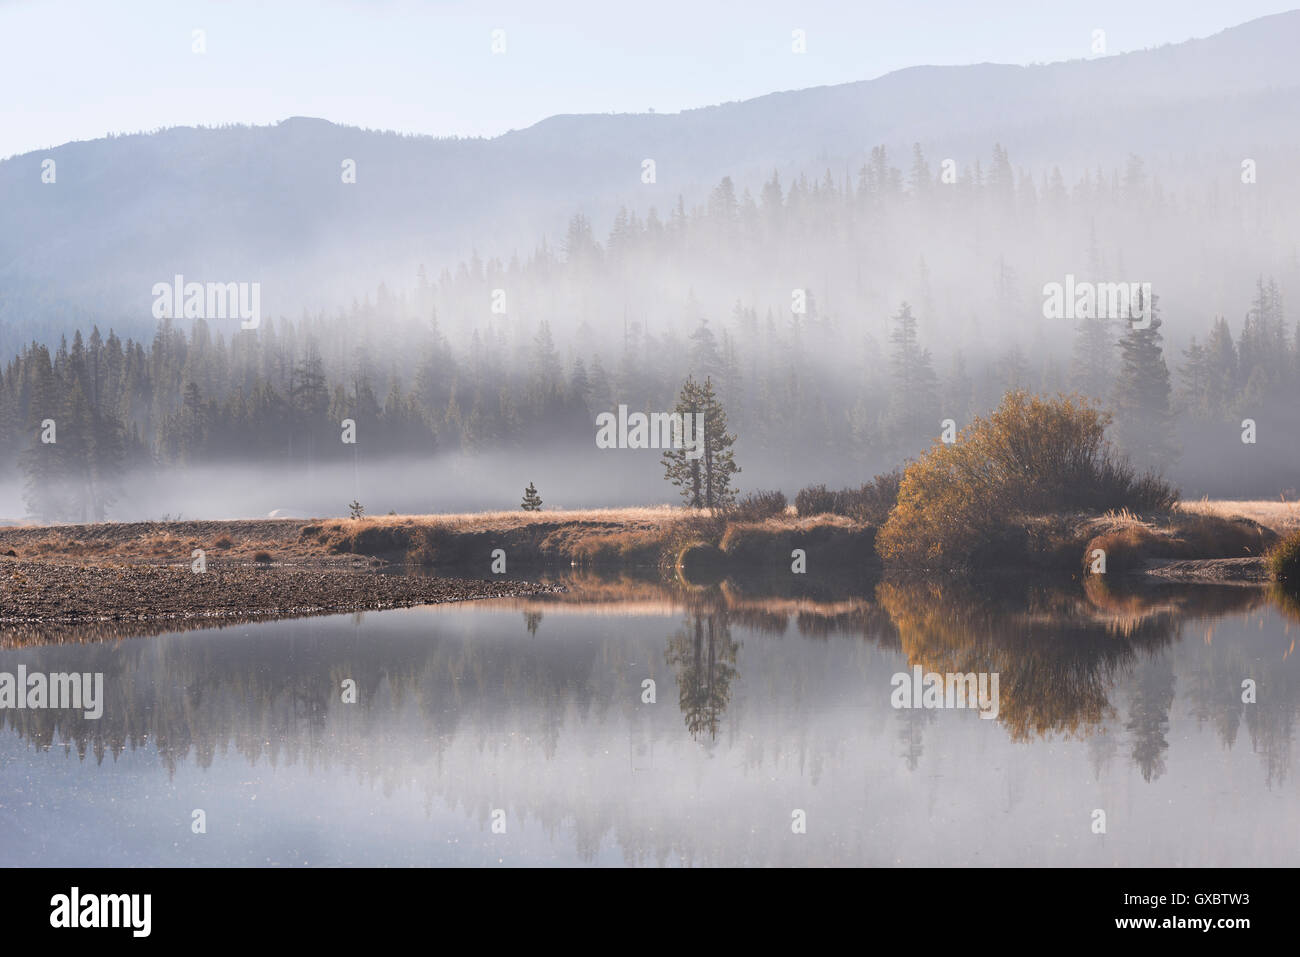 Early morning mist over Tuolumne Meadows, Yosemite National Park, California, USA. Autumn (October) 2014. - Stock Image